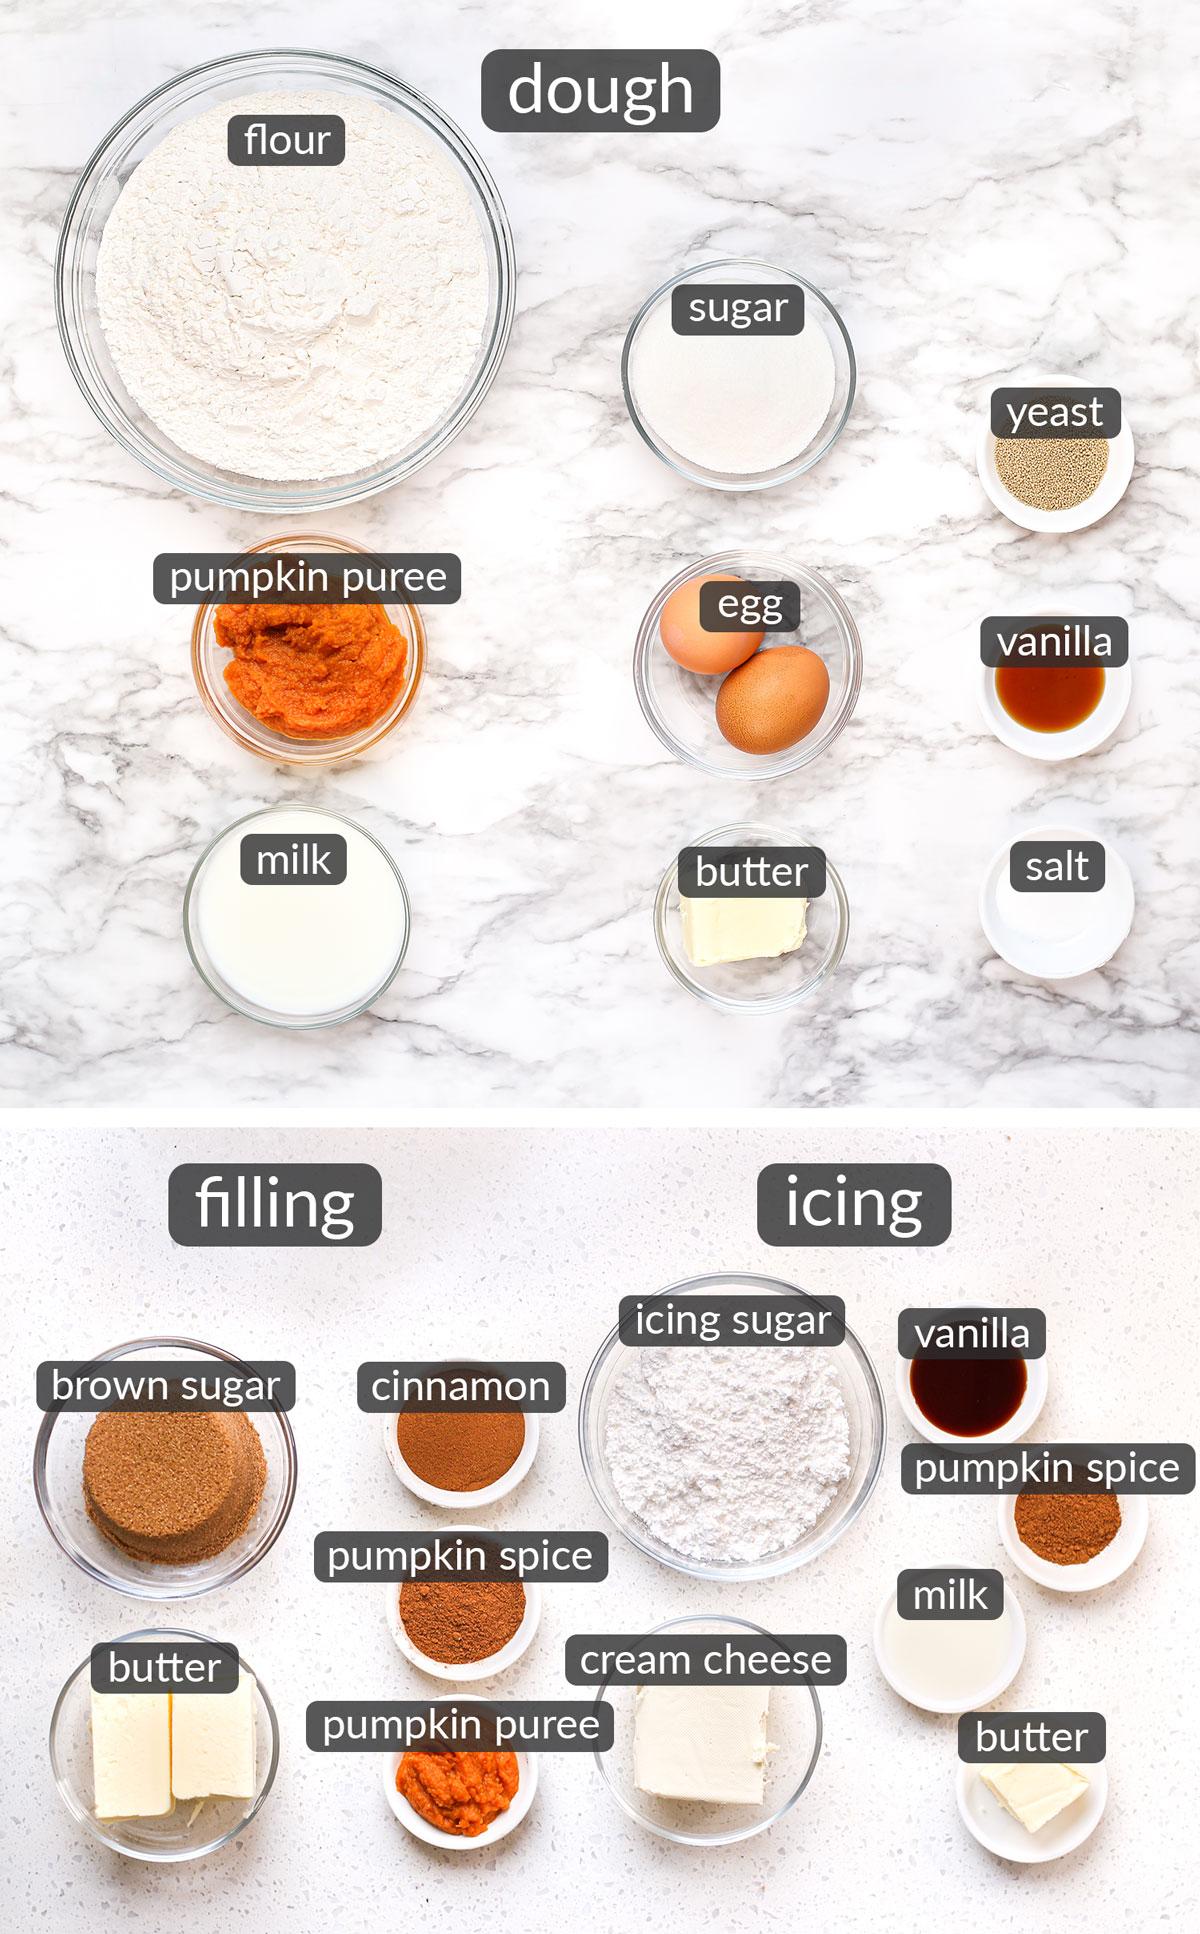 ingredients used to make Pumpkin Spice Cinnamon Rolls